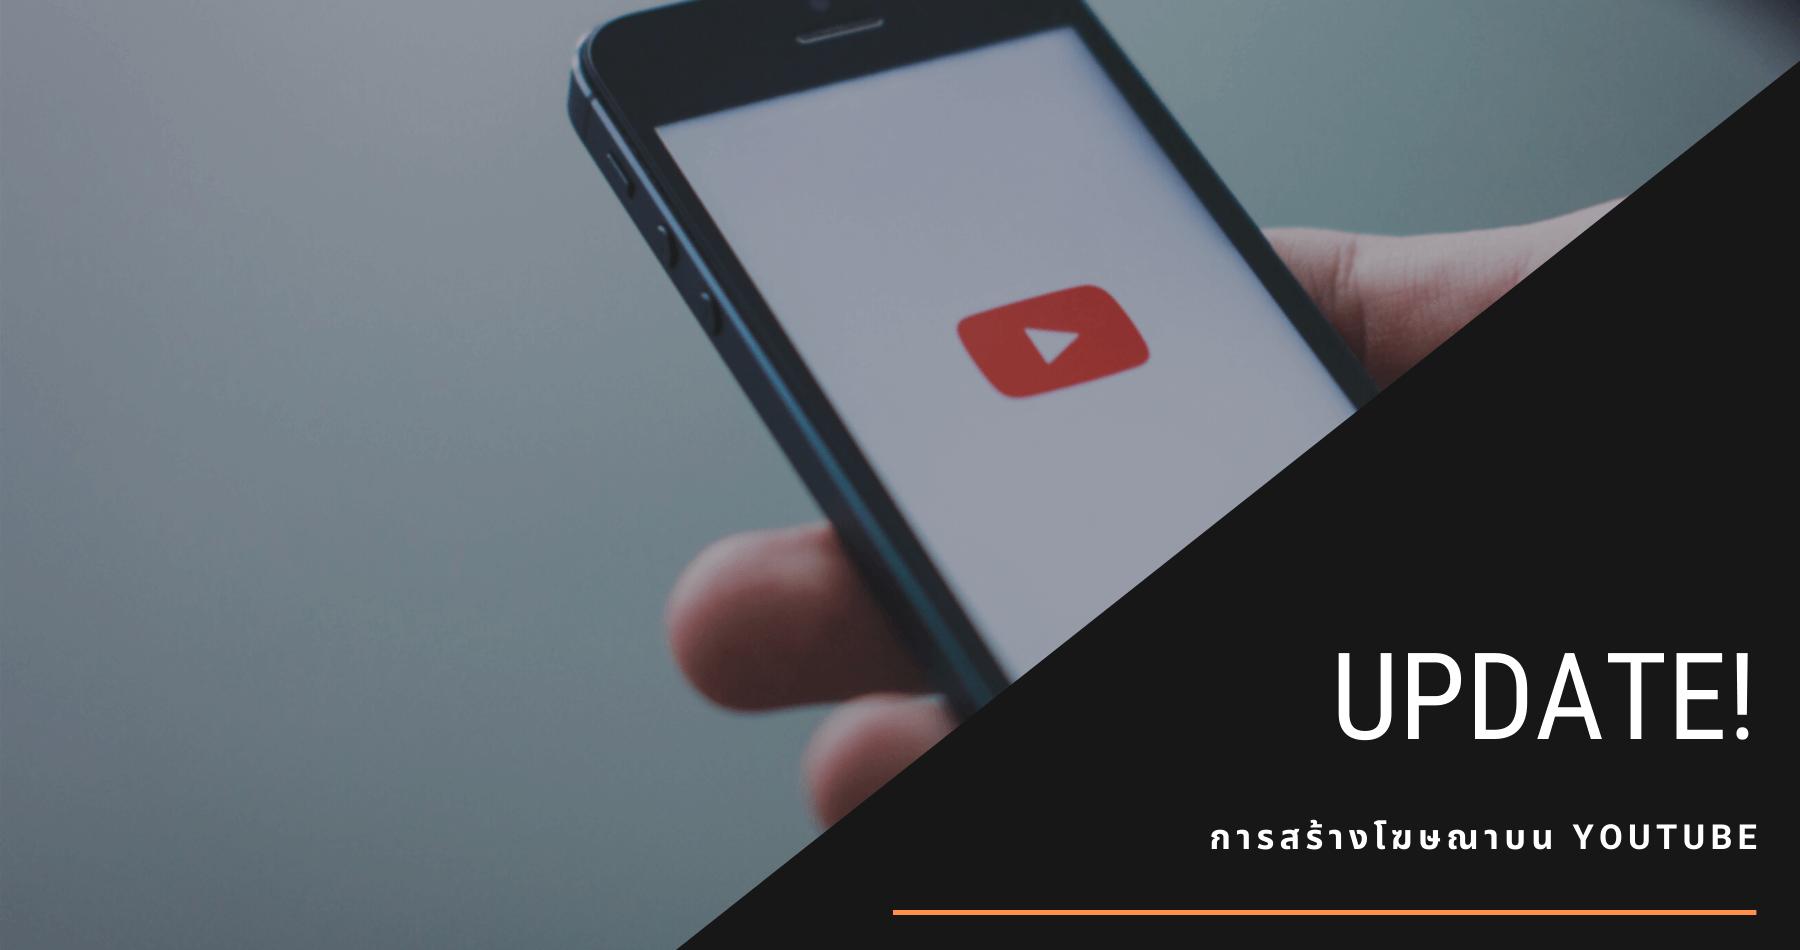 Update! การสร้างโฆษณาบน YouTube